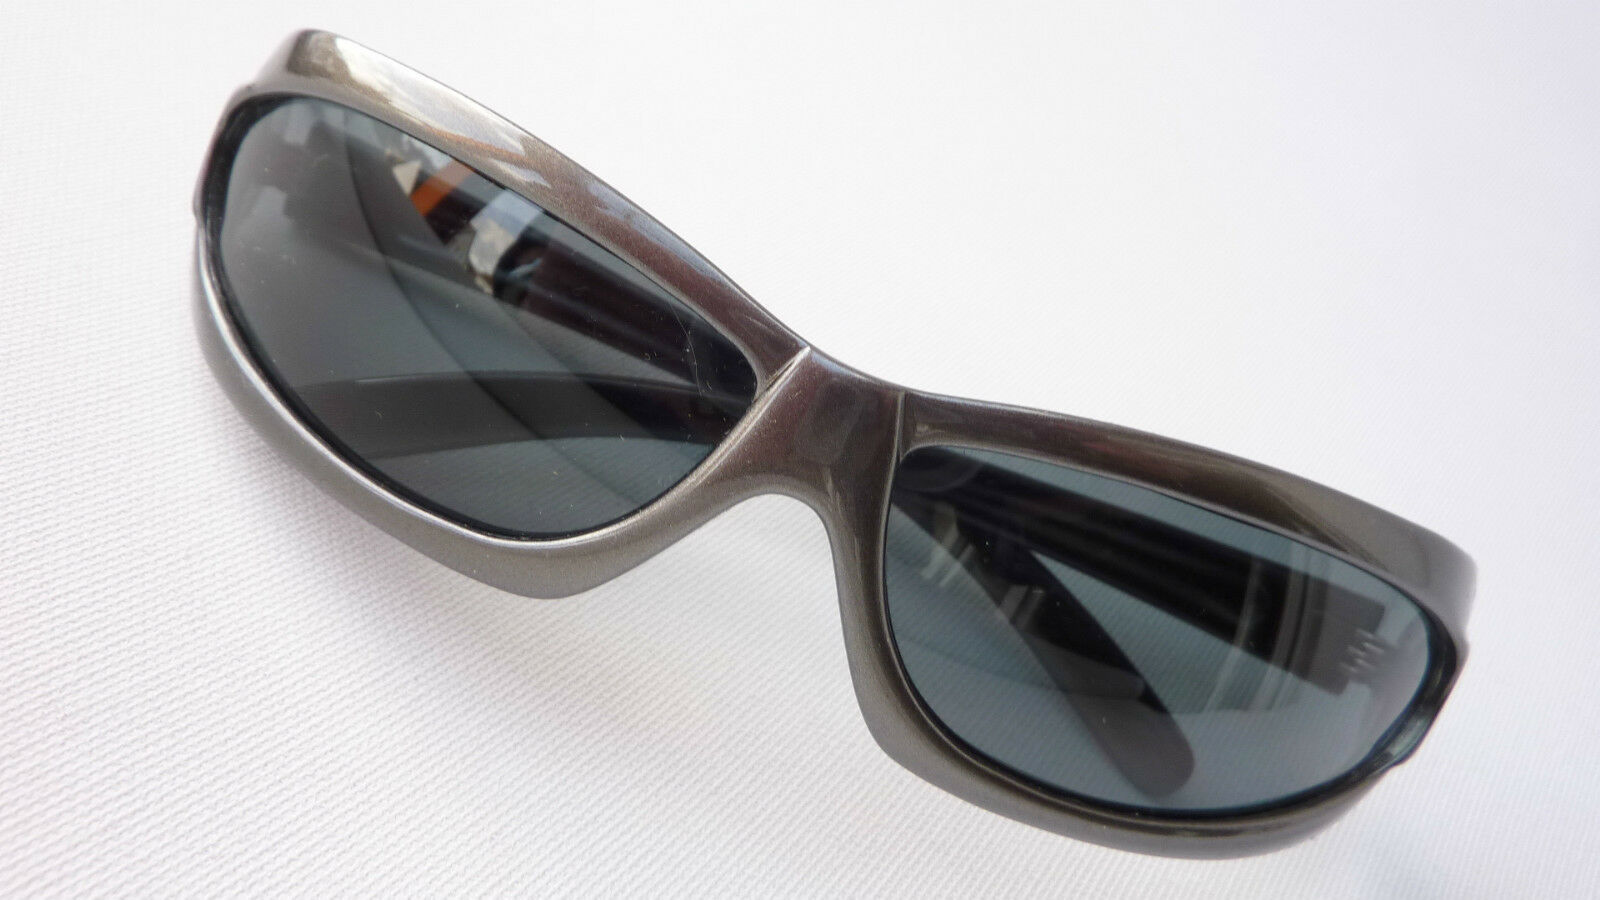 Resistor silbergraue Sonnenbrille dunkelgraue Gläser Fahrradbrille Größe M     | Trendy